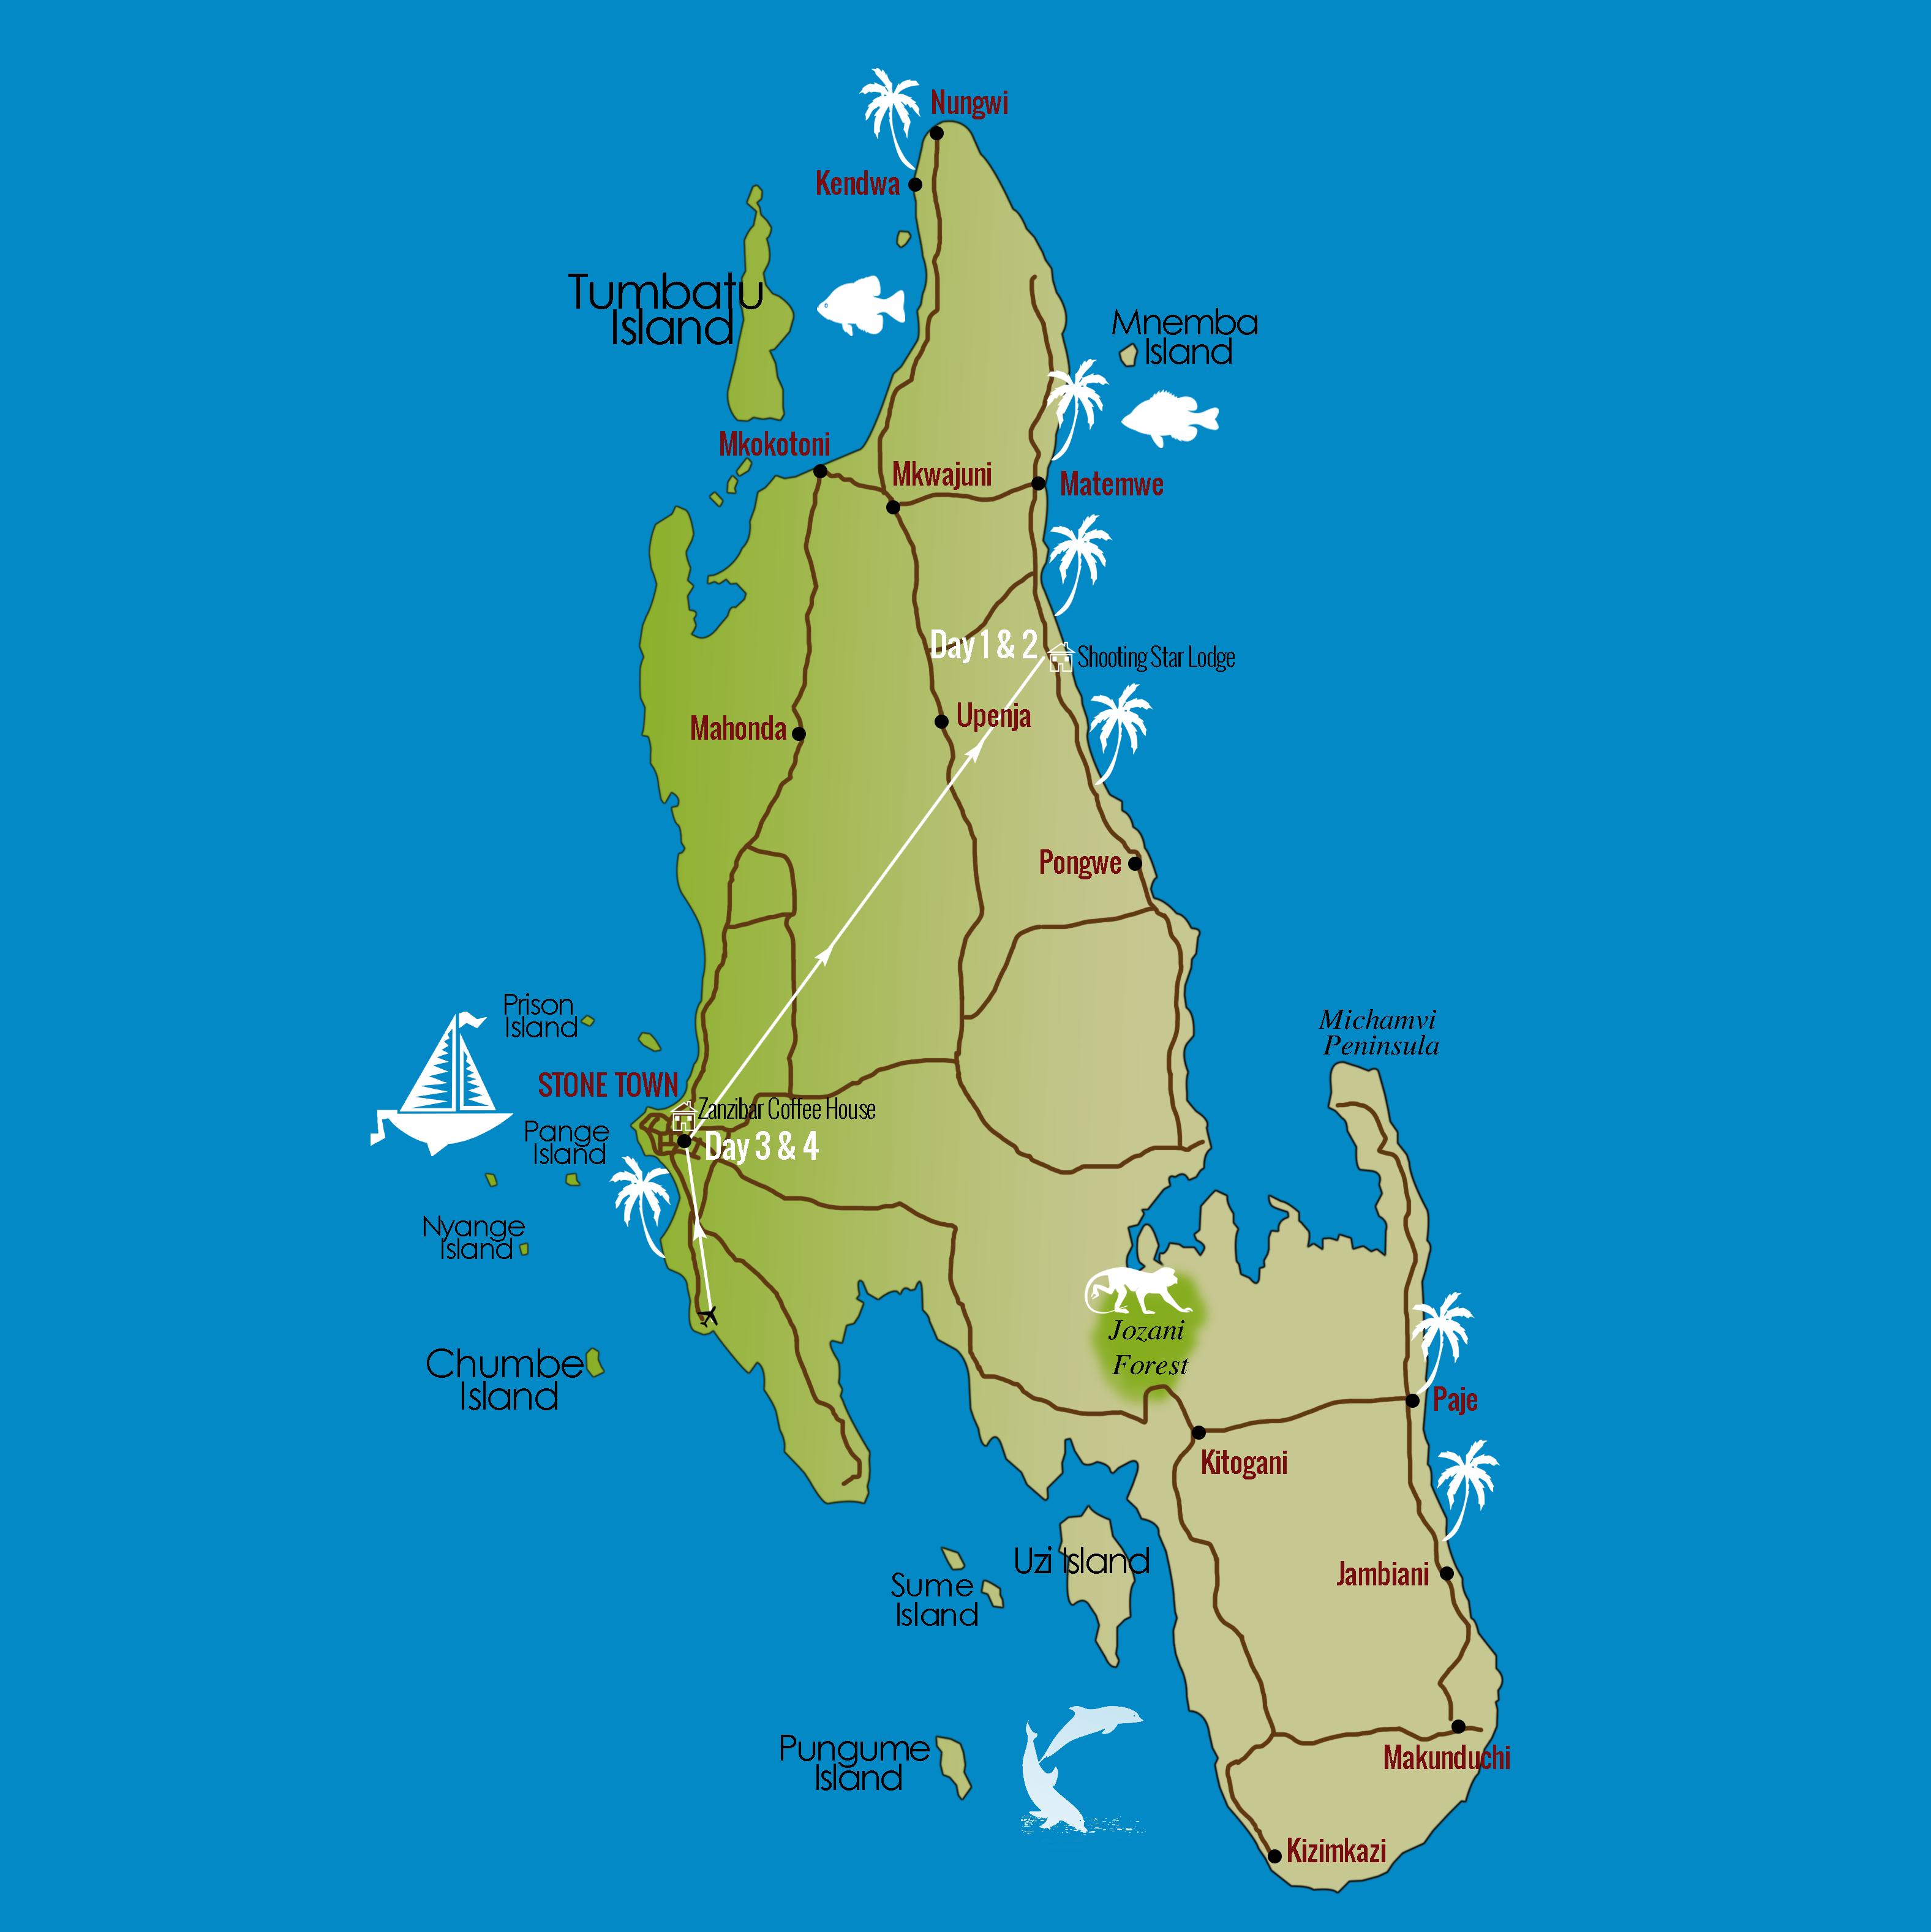 stone town carte